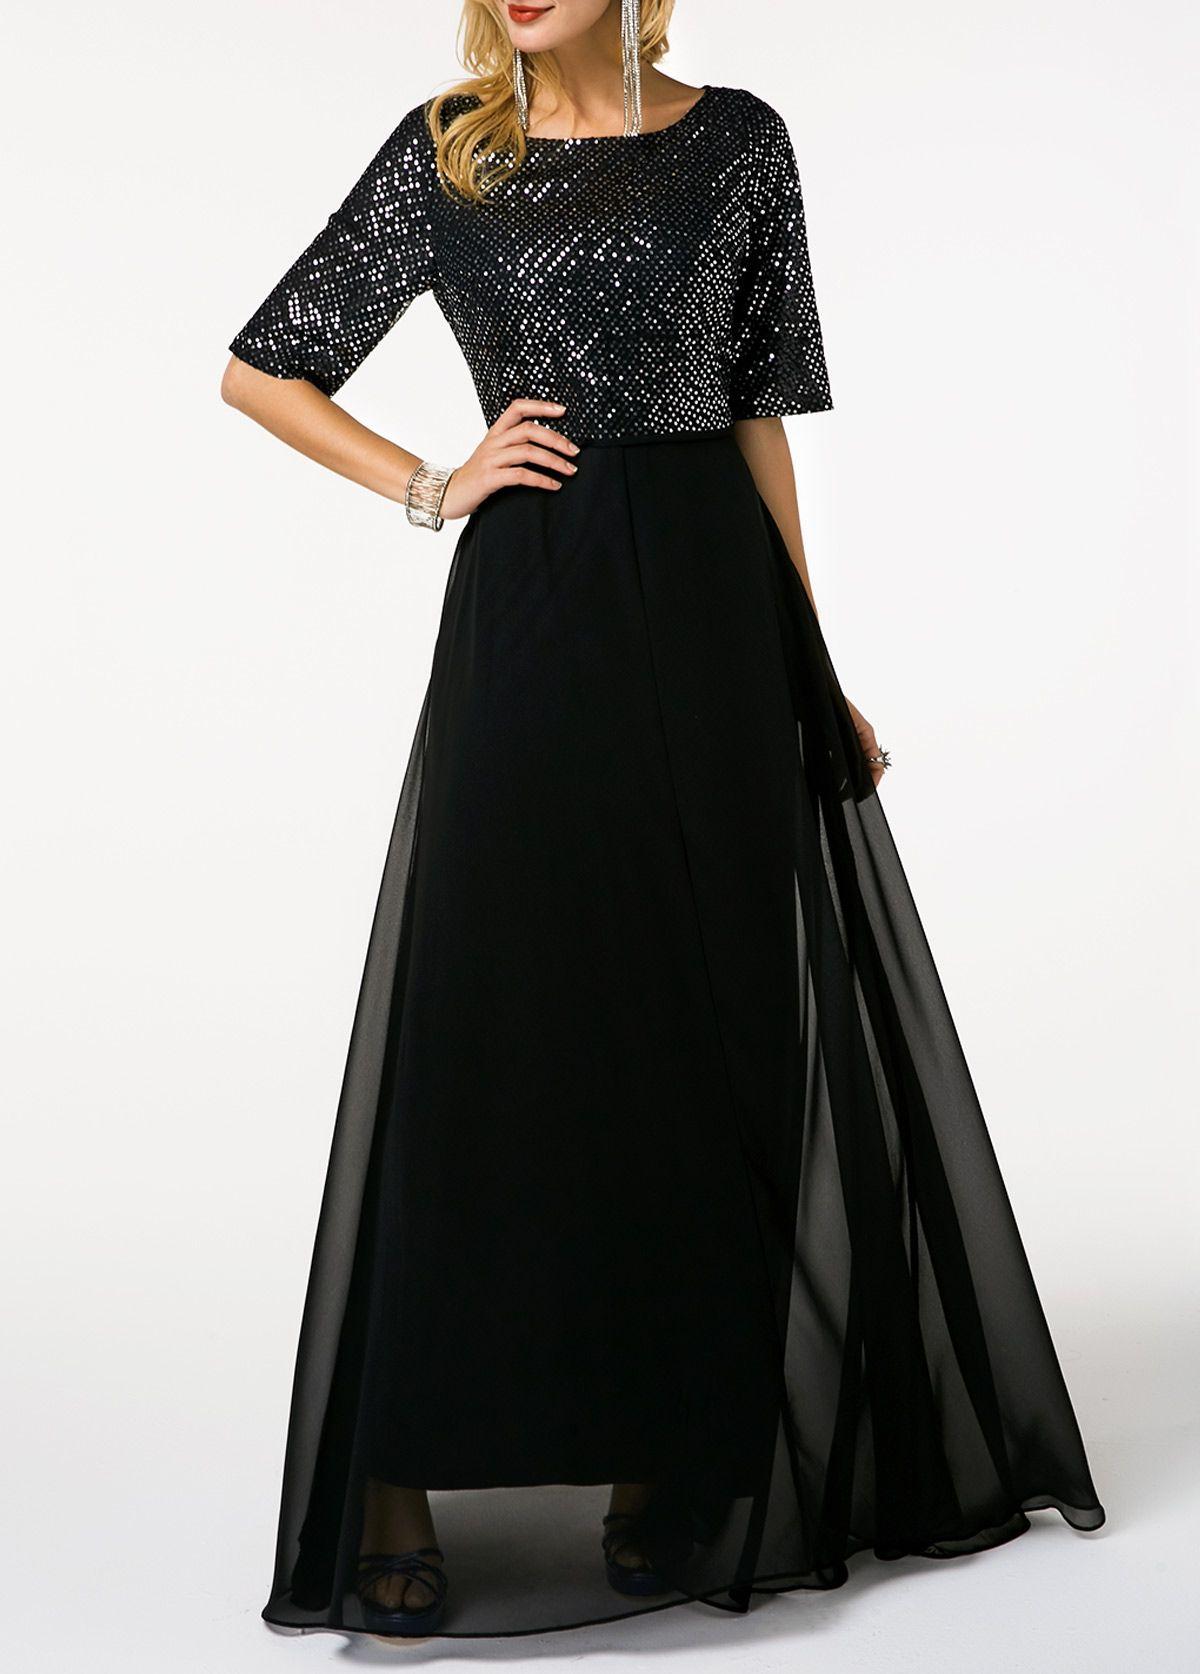 Half Sleeve Sequin Embellished Black Chiffon Maxi Dress Rotita Com Usd 32 77 Half Sleeve Dresses Chiffon Maxi Dress Black Chiffon Maxi Dress [ 1674 x 1200 Pixel ]